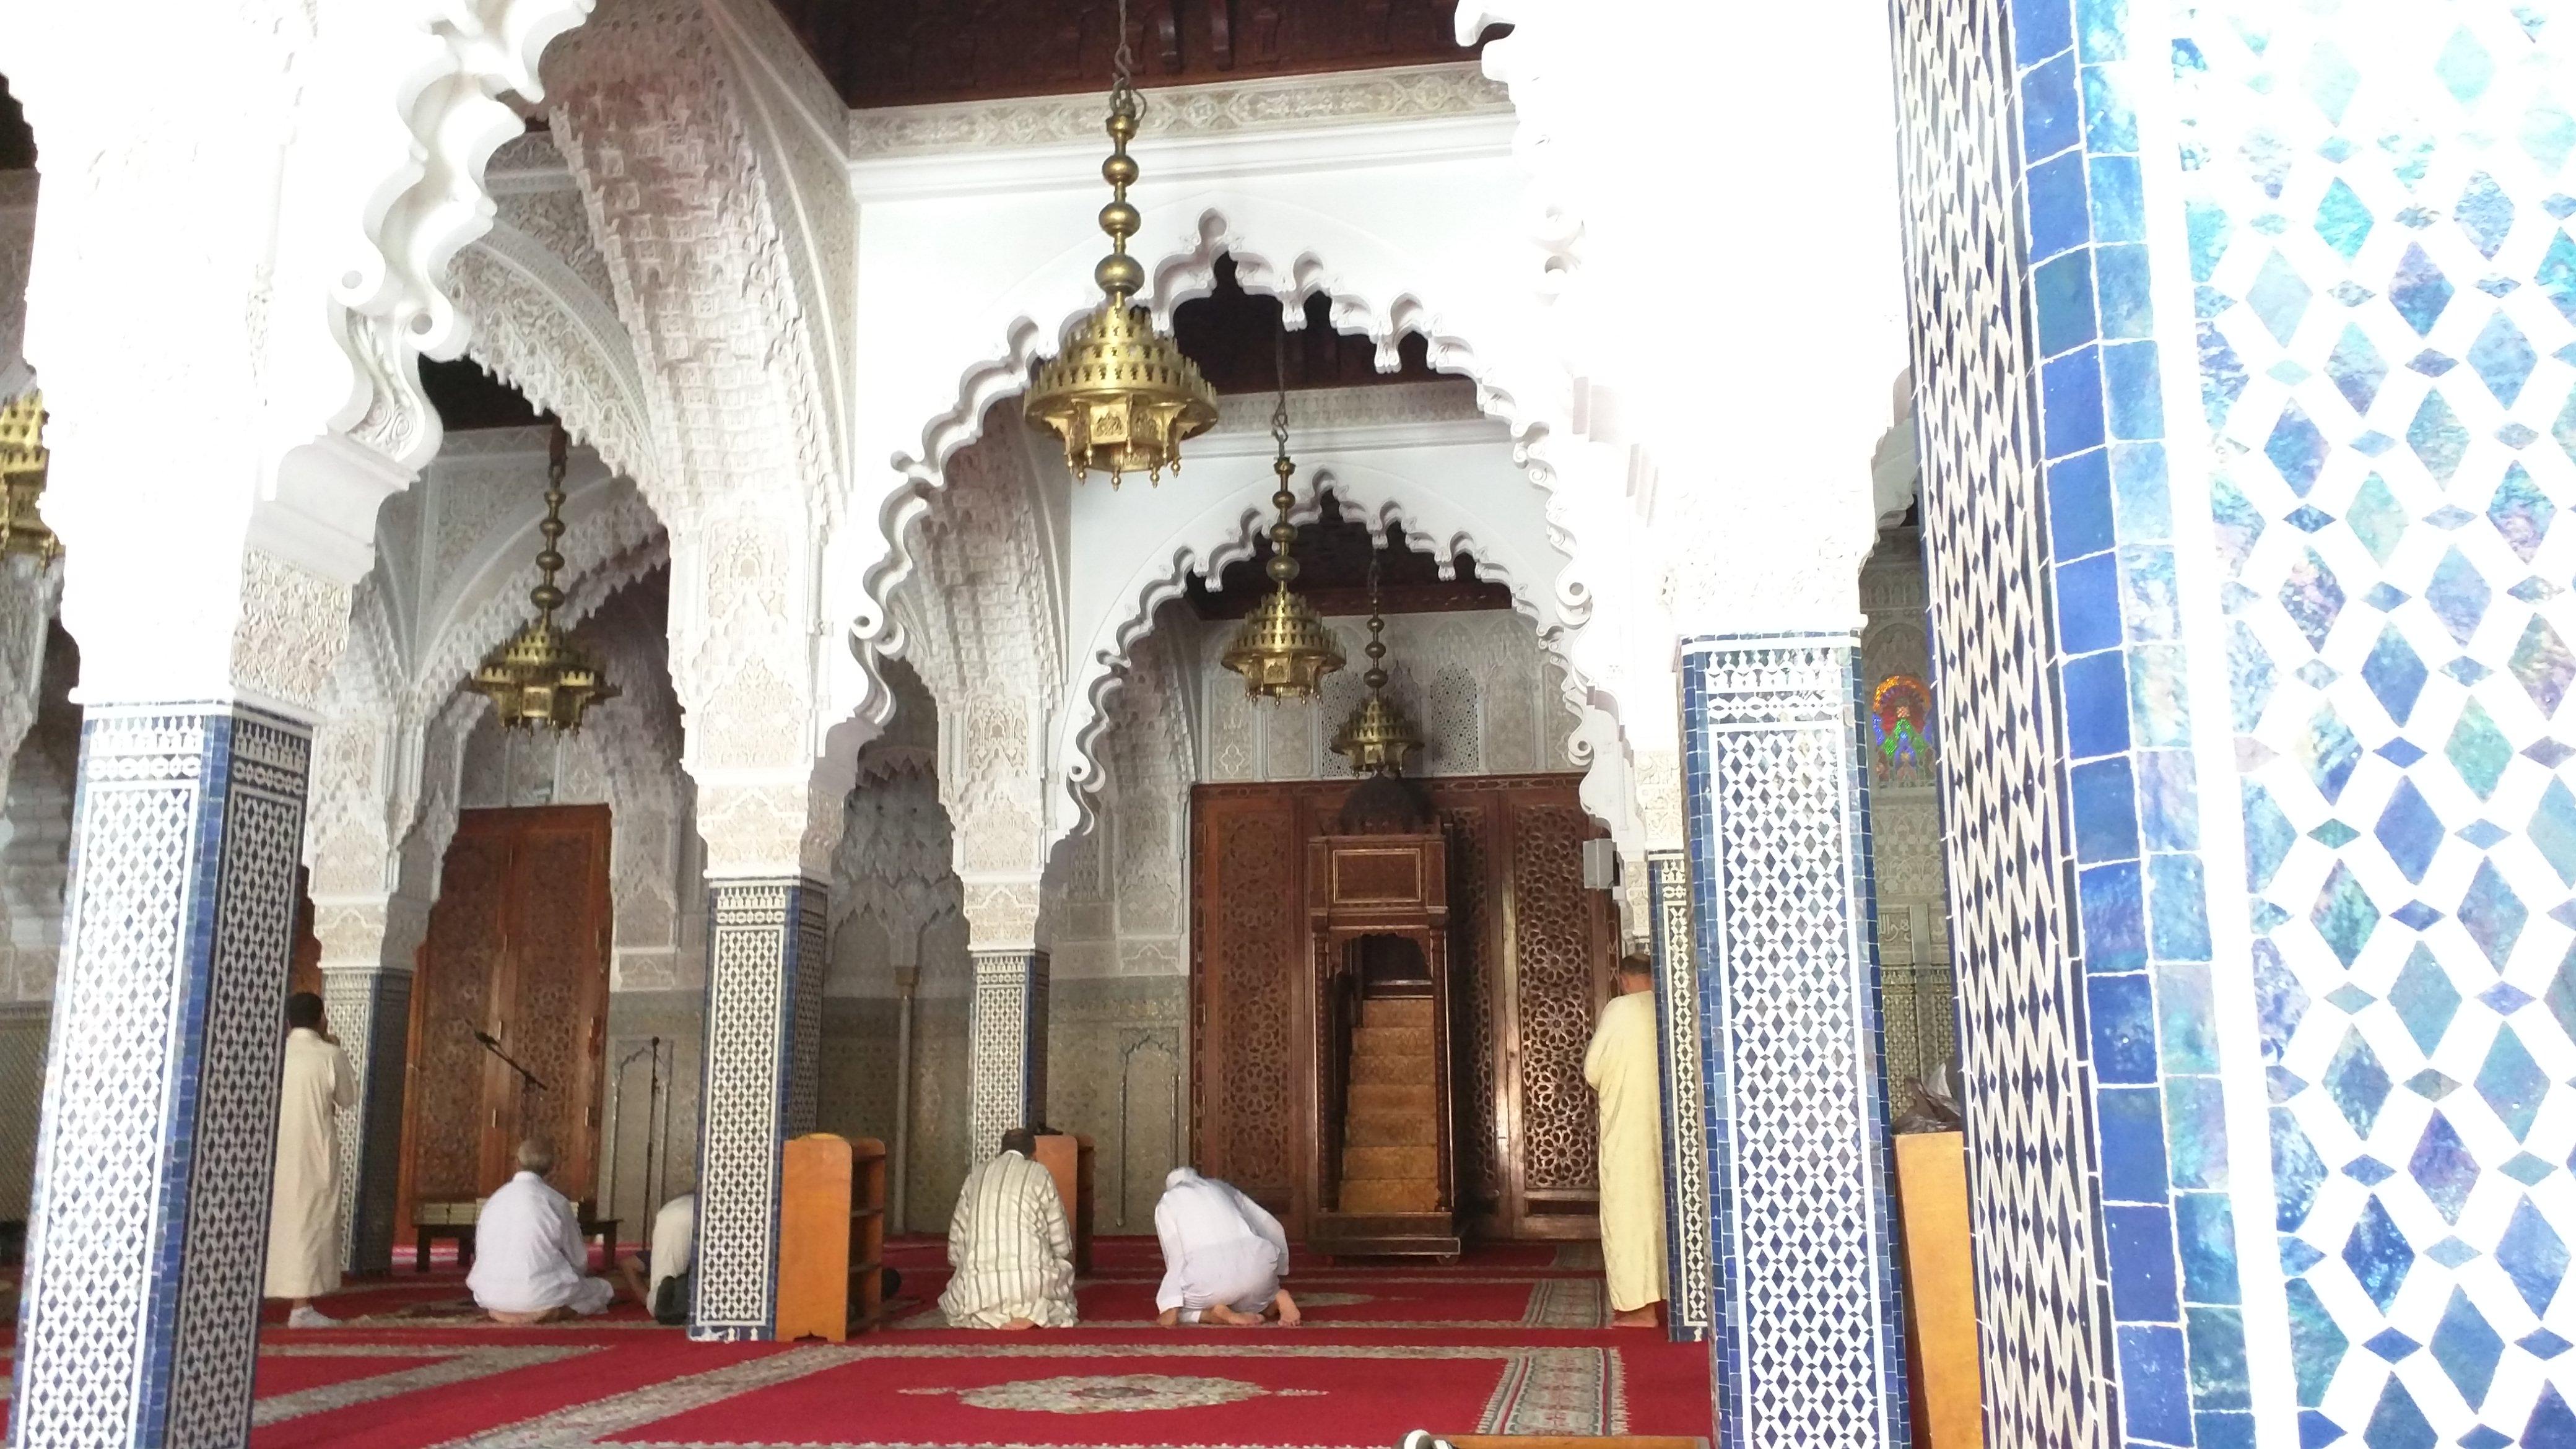 Inside Masjid Hassan